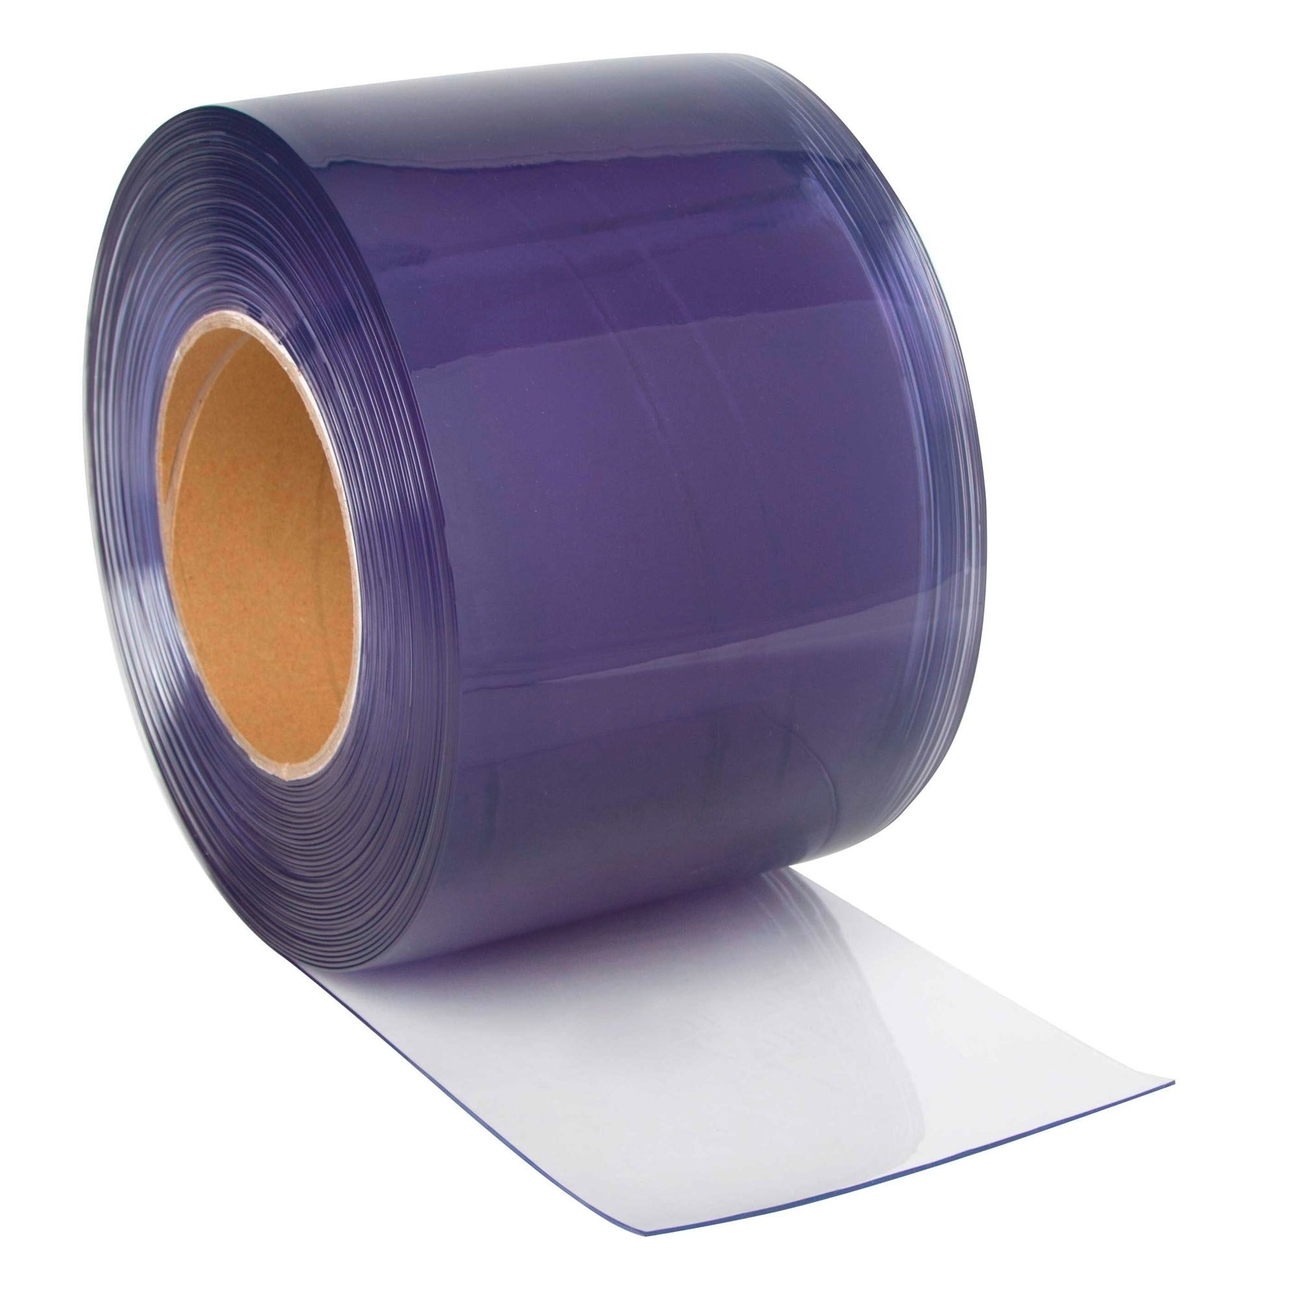 Kerbl PVC-Streifenvorhang, 30 cm x 3mm, 25m Rolle